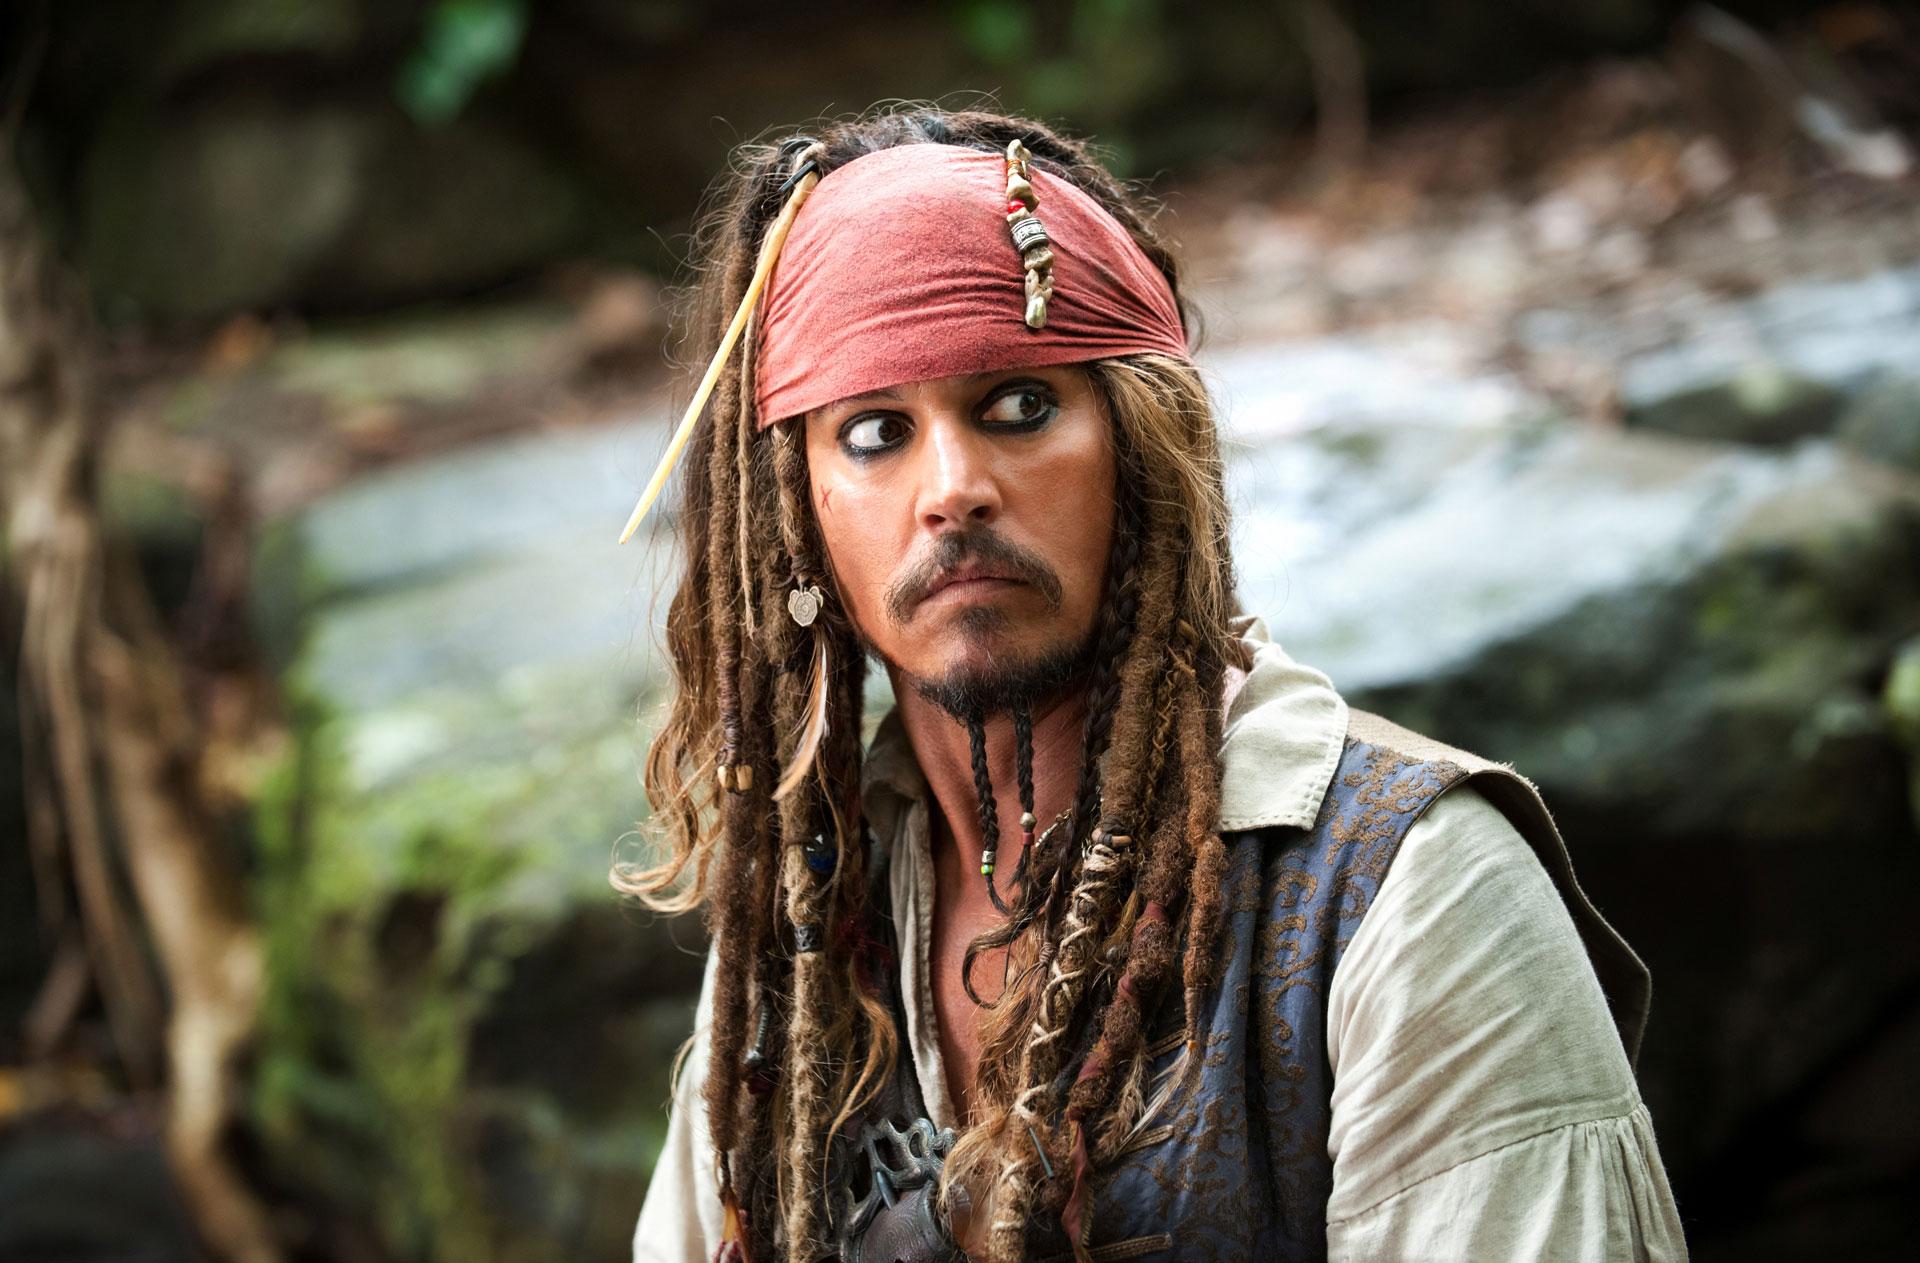 pirati-dei-caraibi-johnny-depp-la-vendetta-di-salazaar